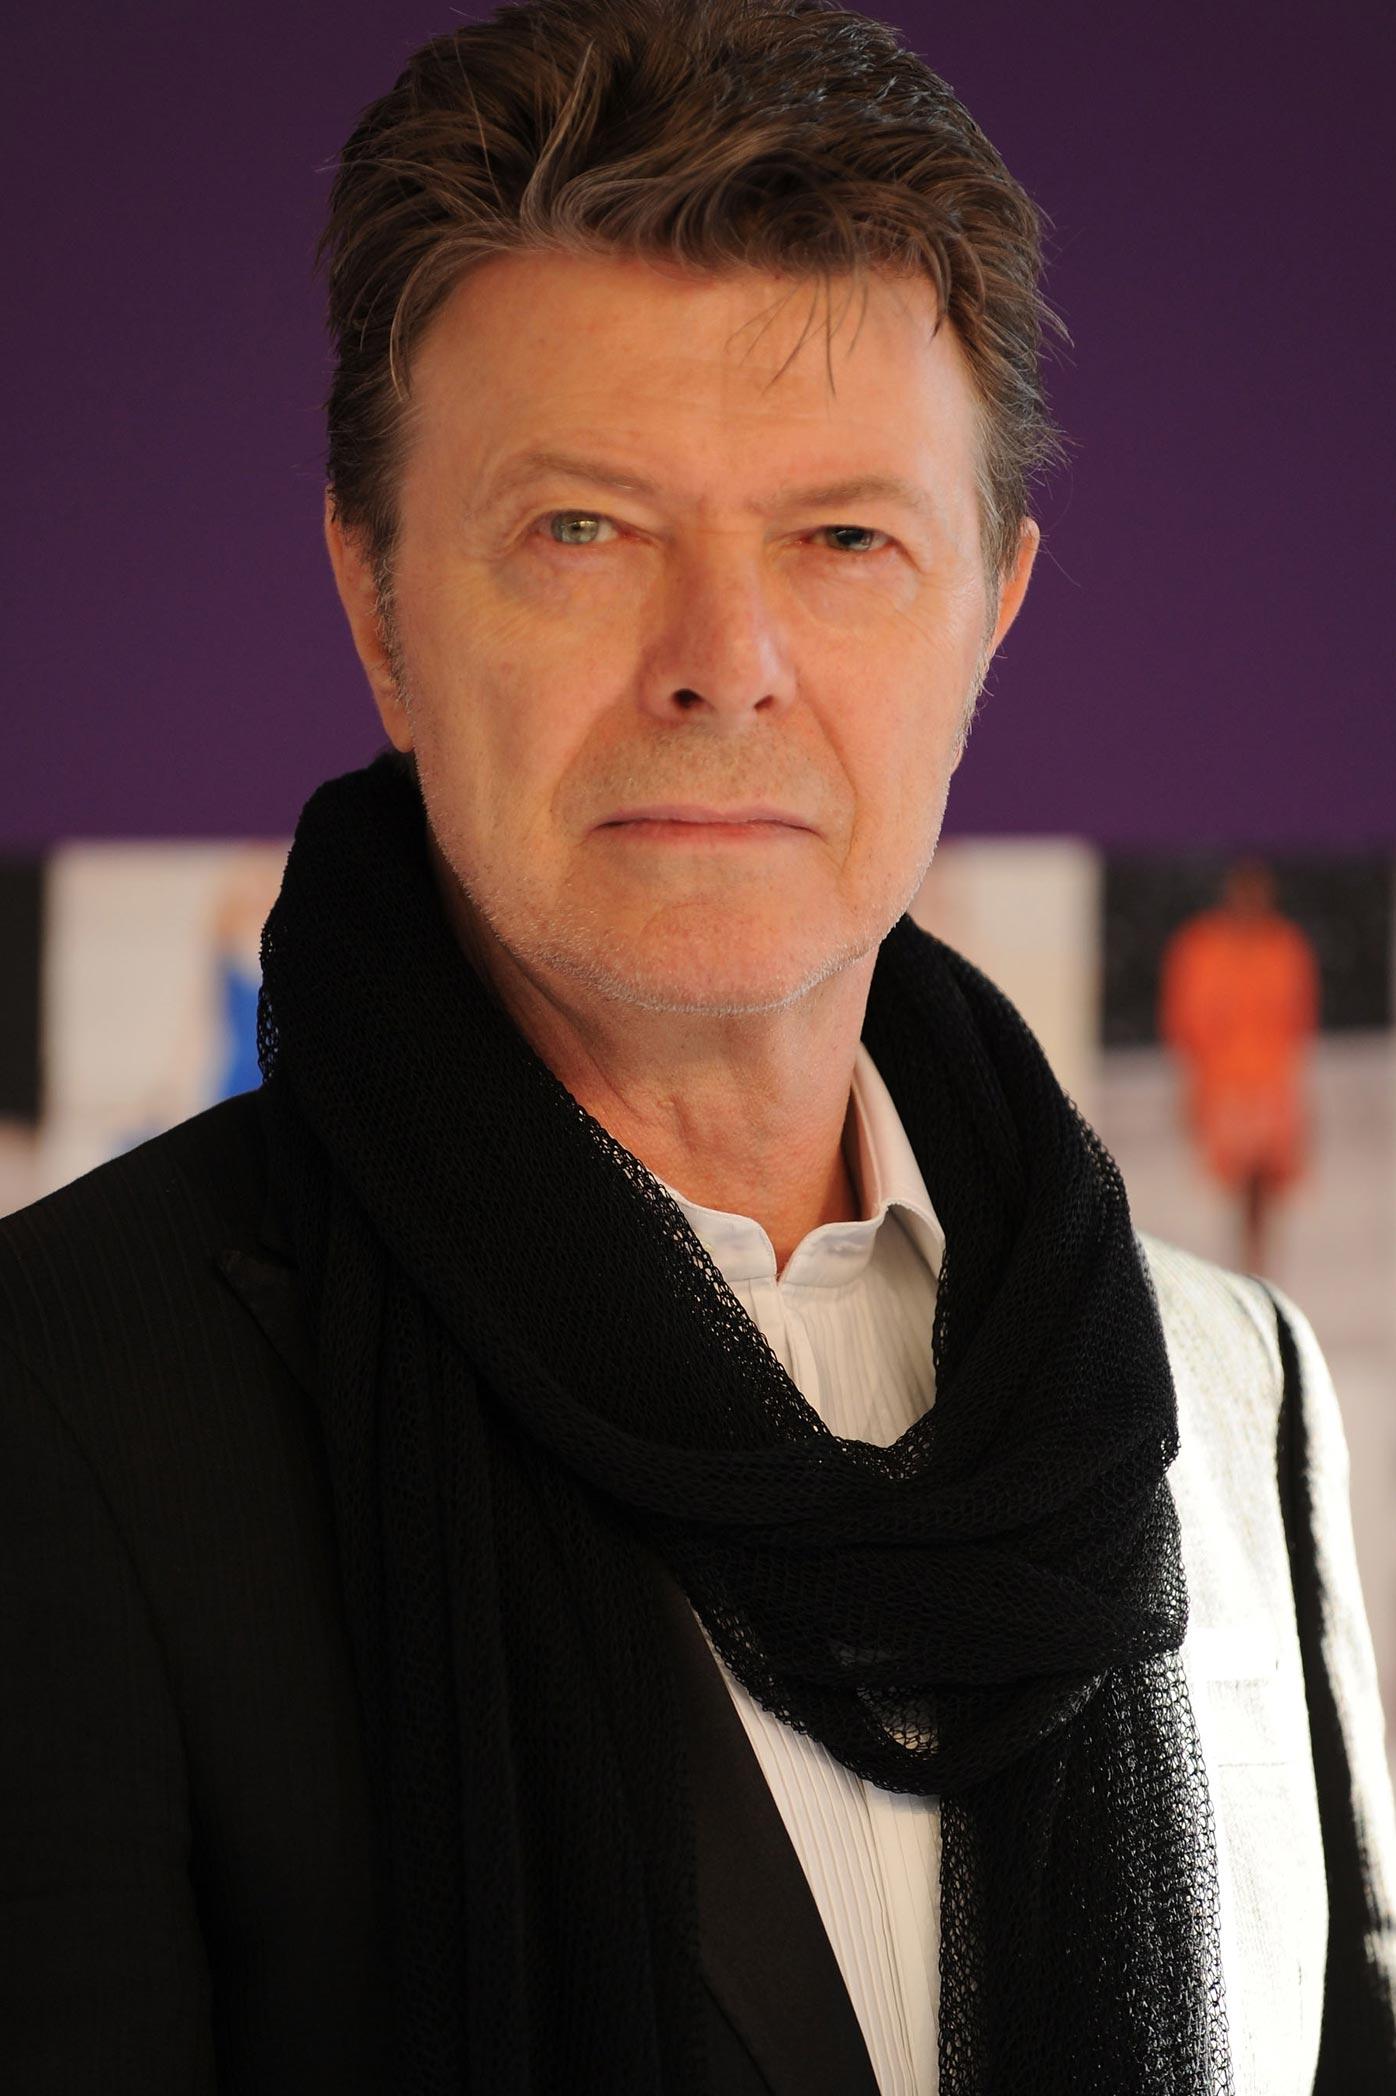 Bowie's last album, Blackstar, was released last Friday.